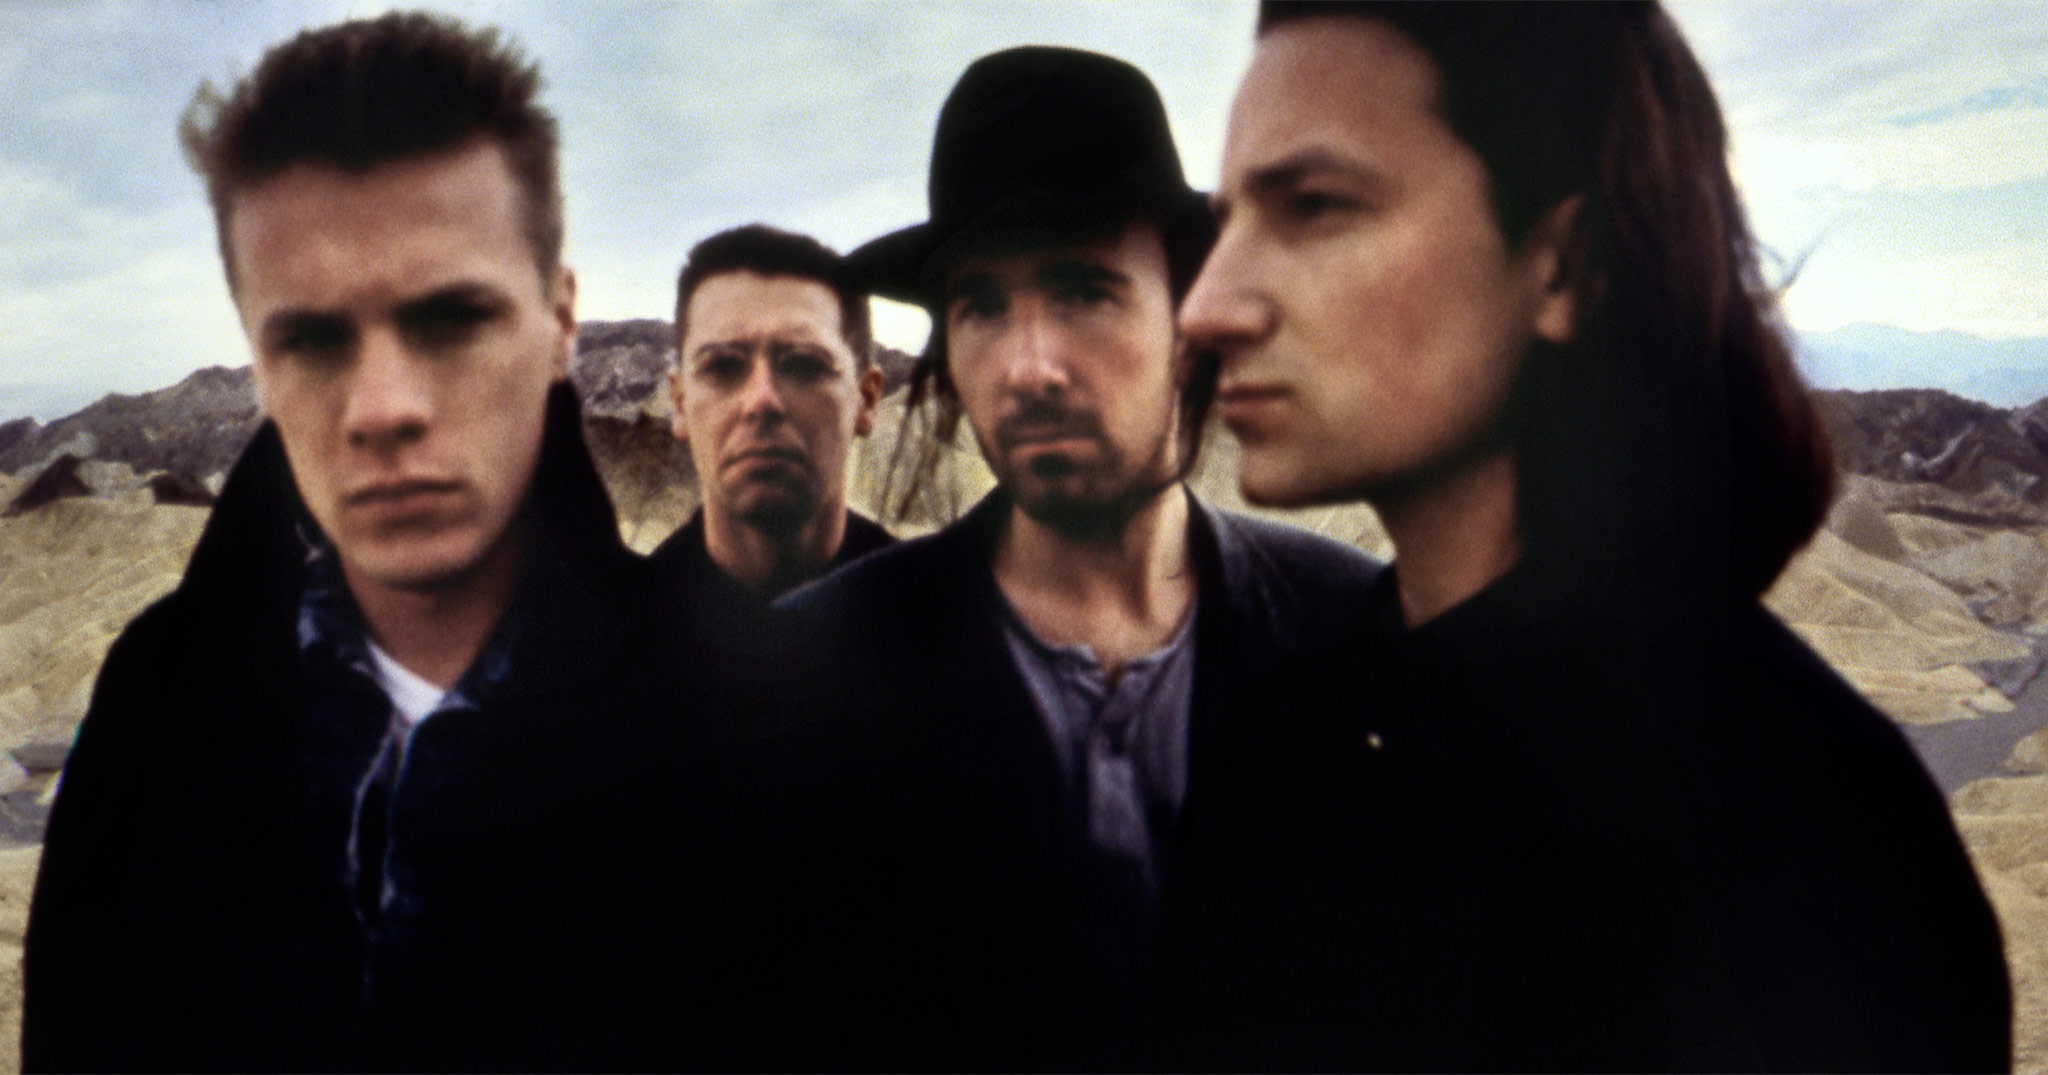 U2 announce Joshua Tree Australasian Tour - Ambient Light